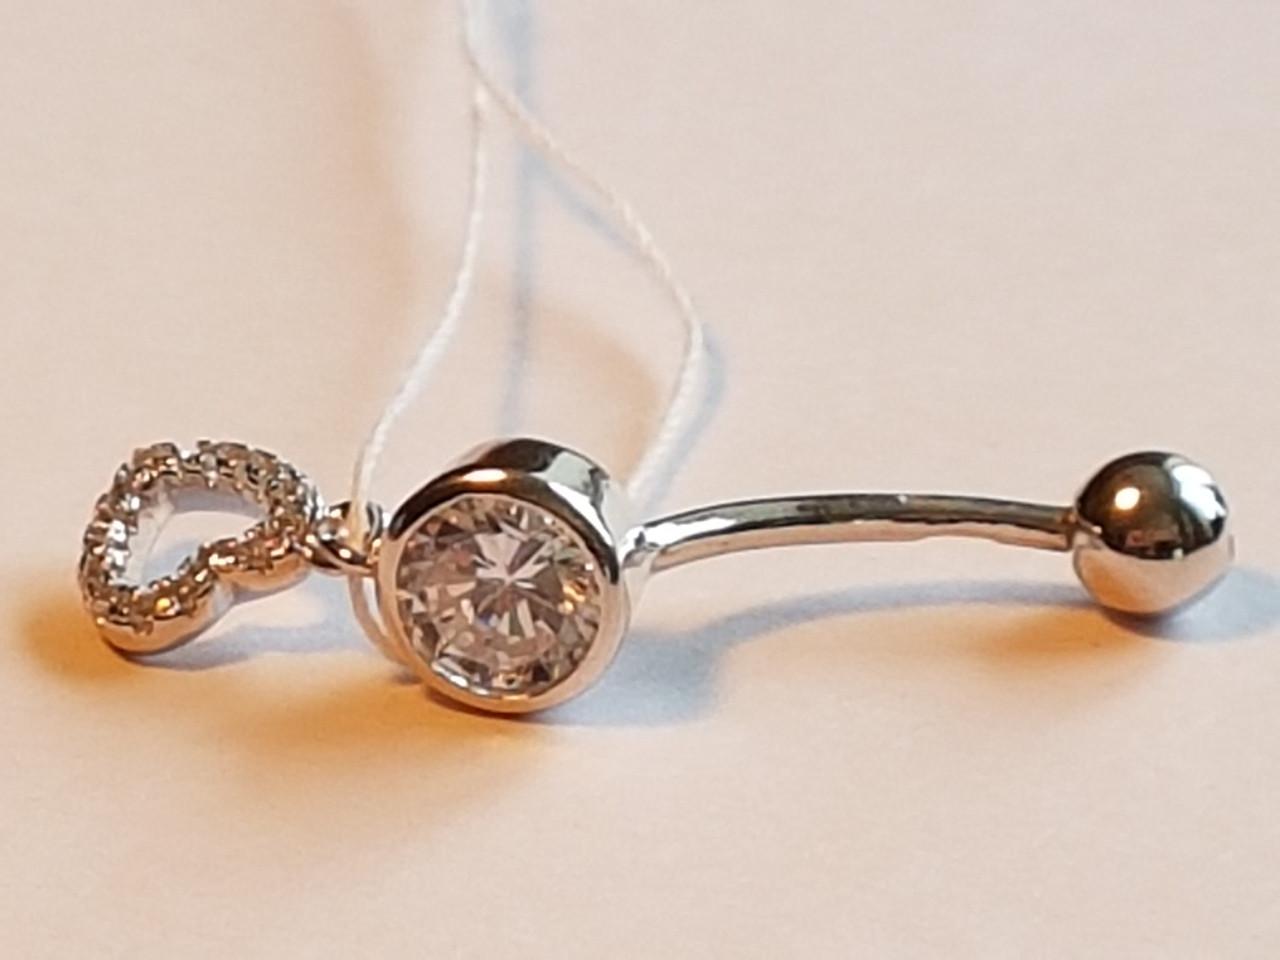 Серебряная серьга для пирсинга пупка. Артикул Пр2Ф/025